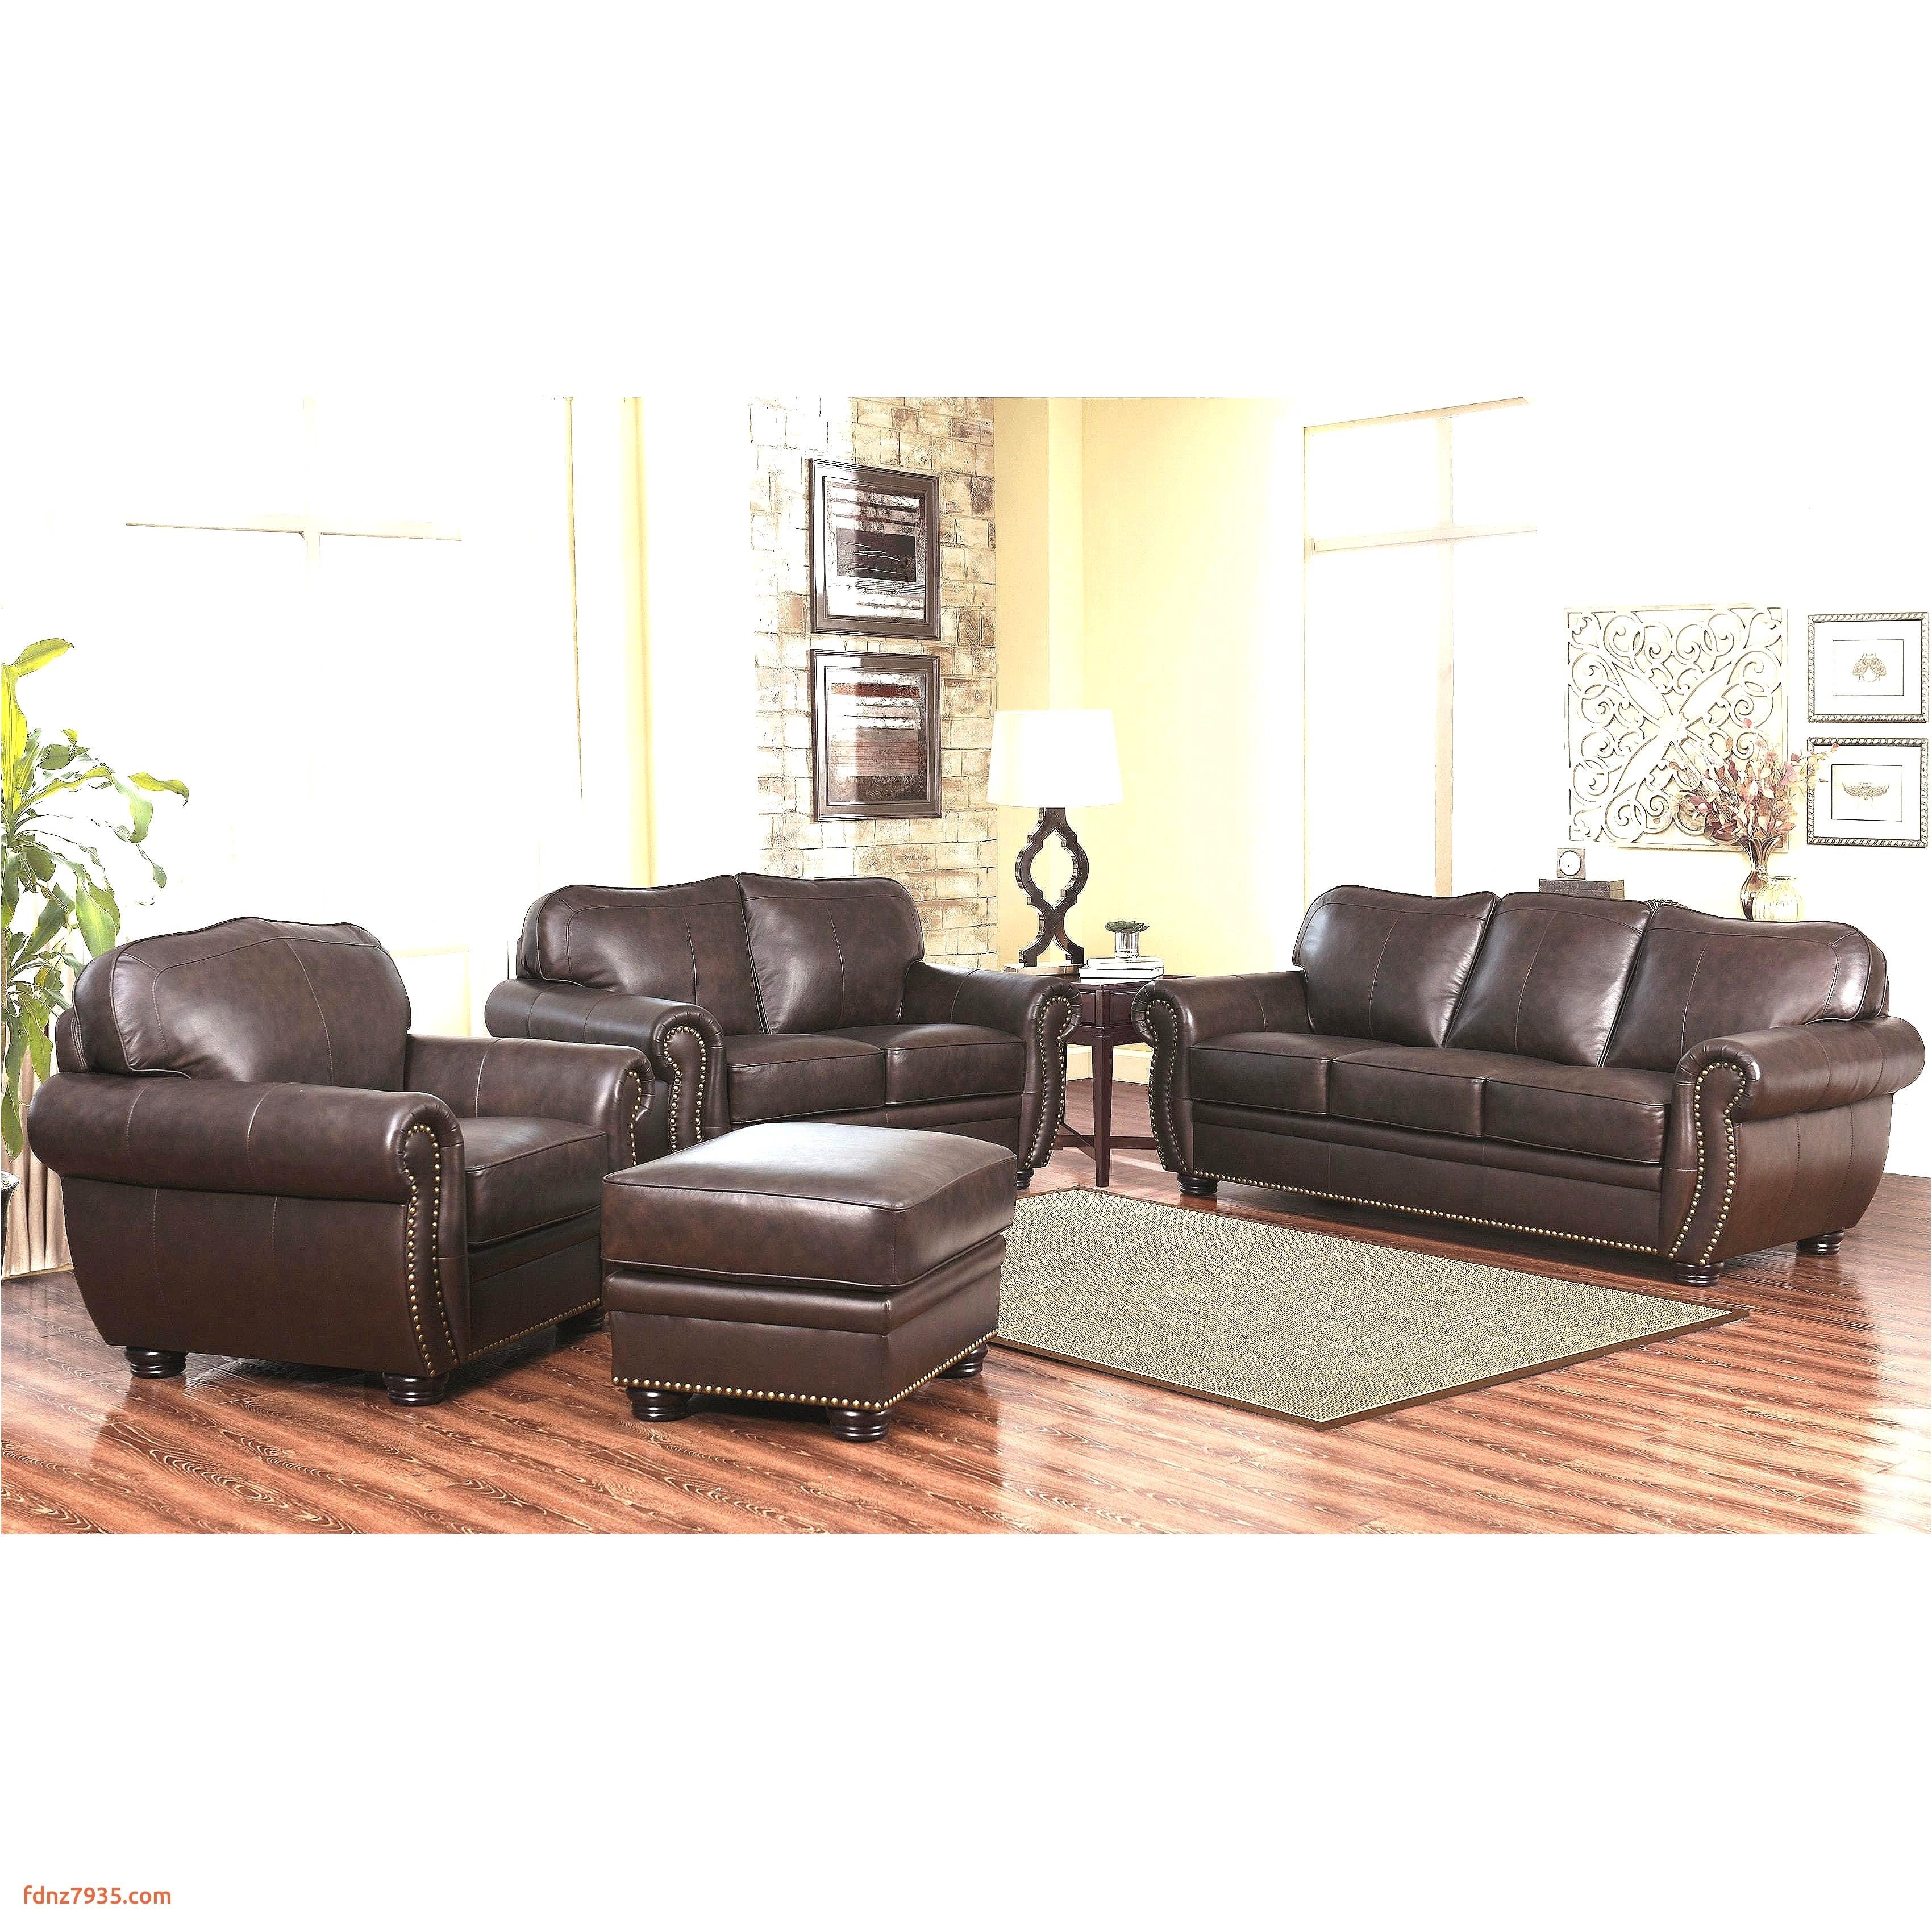 sears sectional sofa fresh sofa design